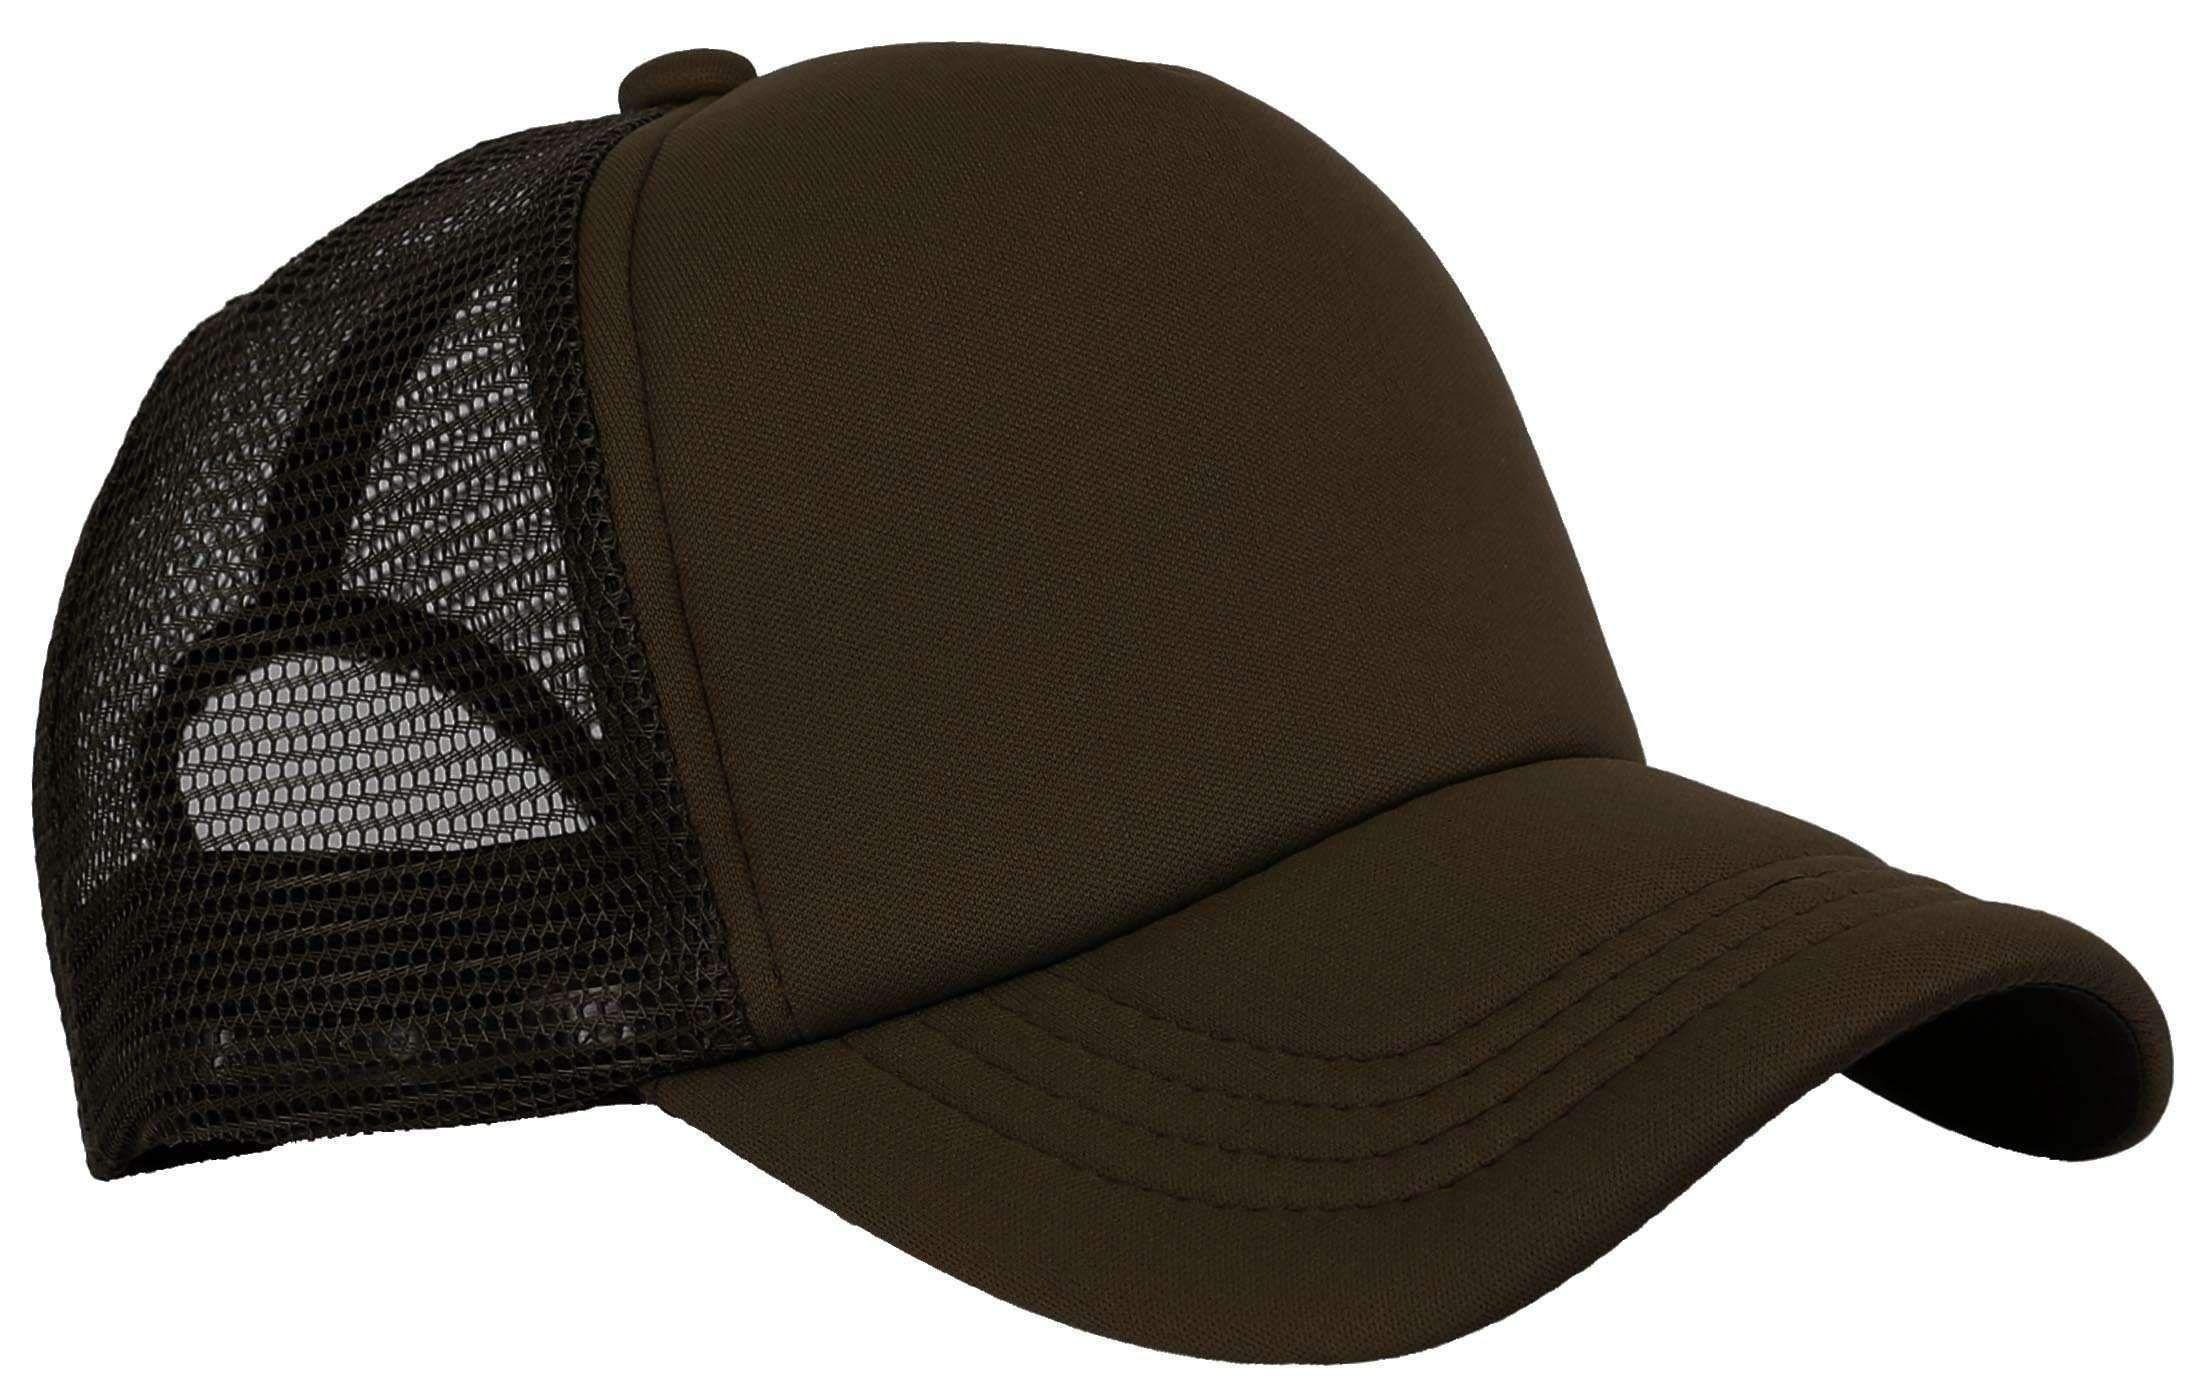 63ec5a707f9 Products · Plain Foam Mesh Baseball Cap